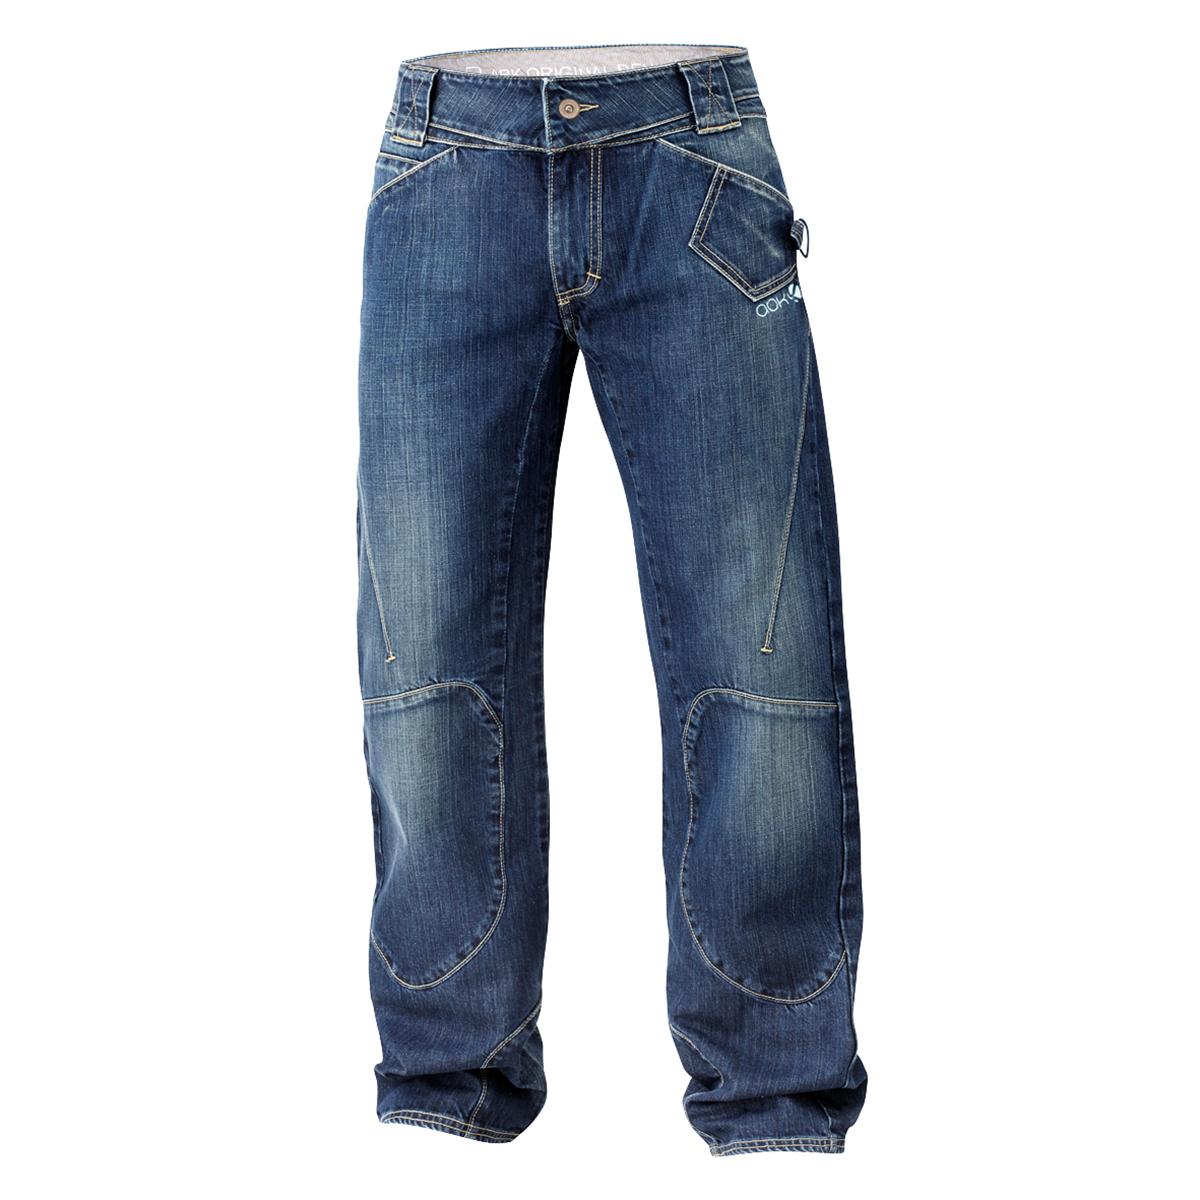 ABK Yoda Original Denim Jeans | Trousers